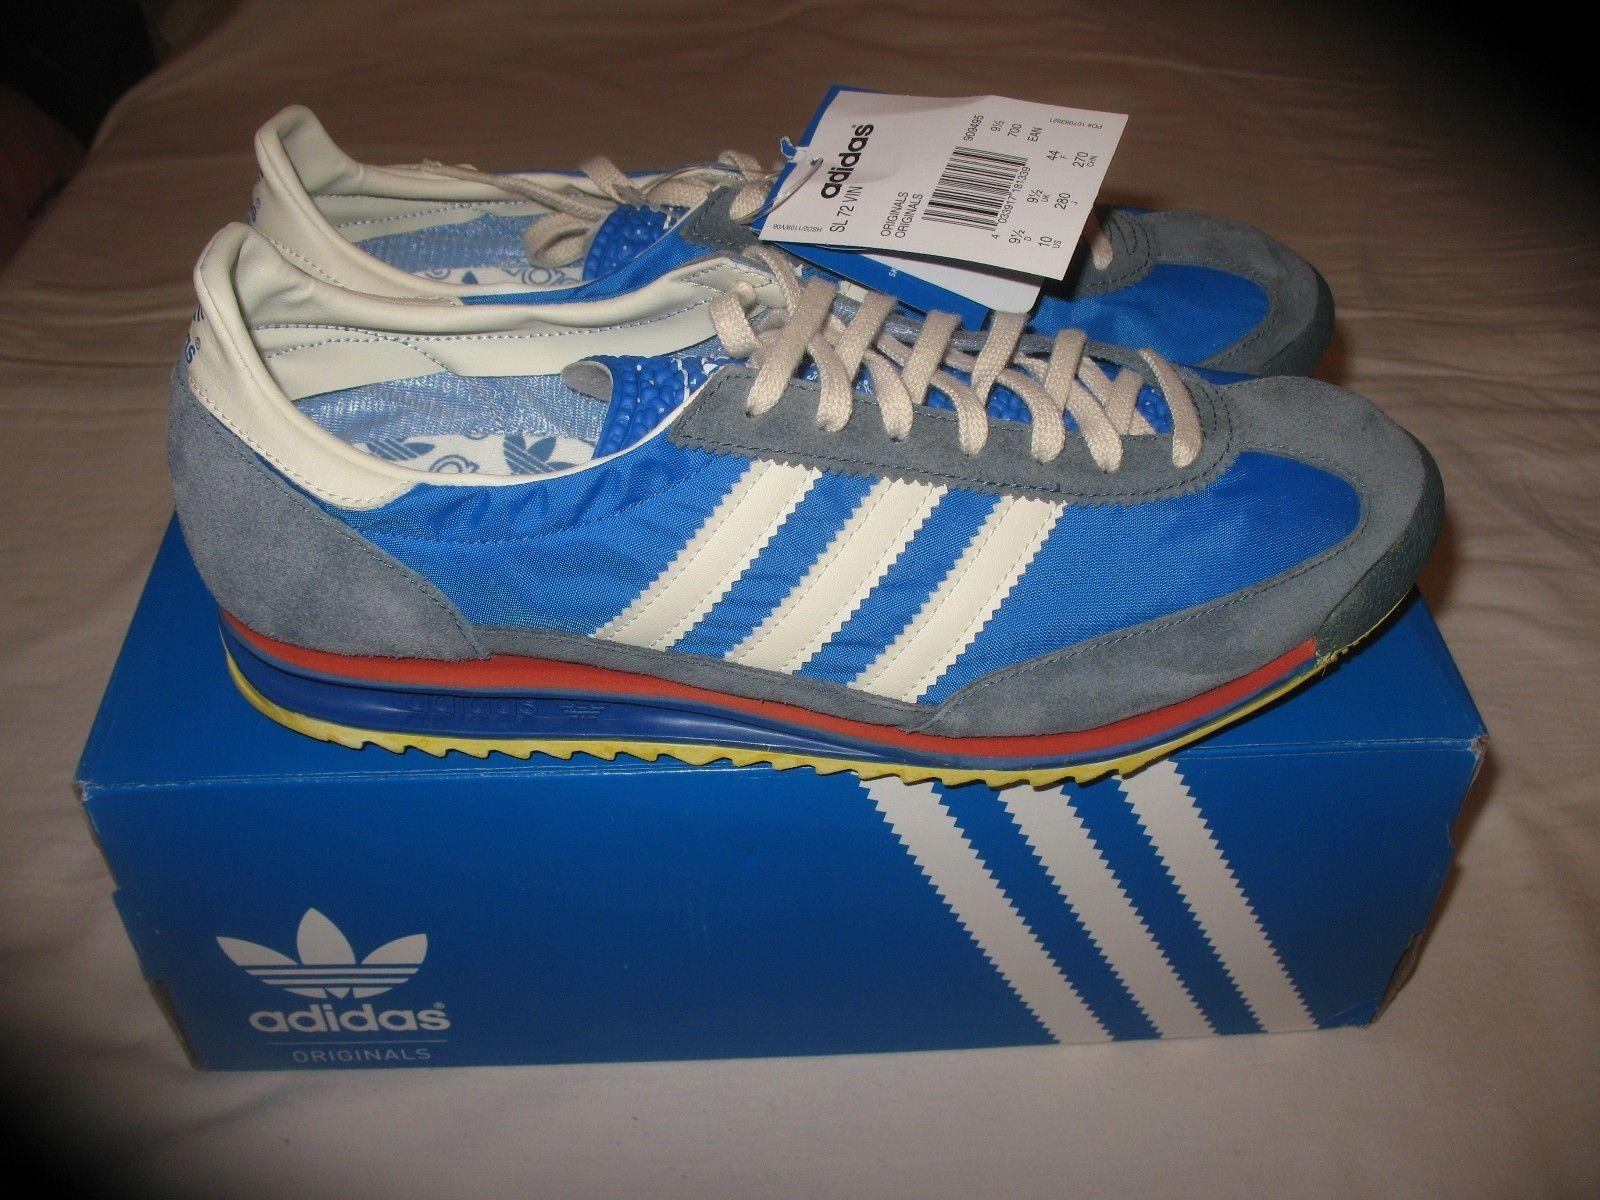 7feab4fbadd NEW Adidas Originals SL 72 VIN UK 10.5 US 11 ART 909495 RARE VINTAGE ...